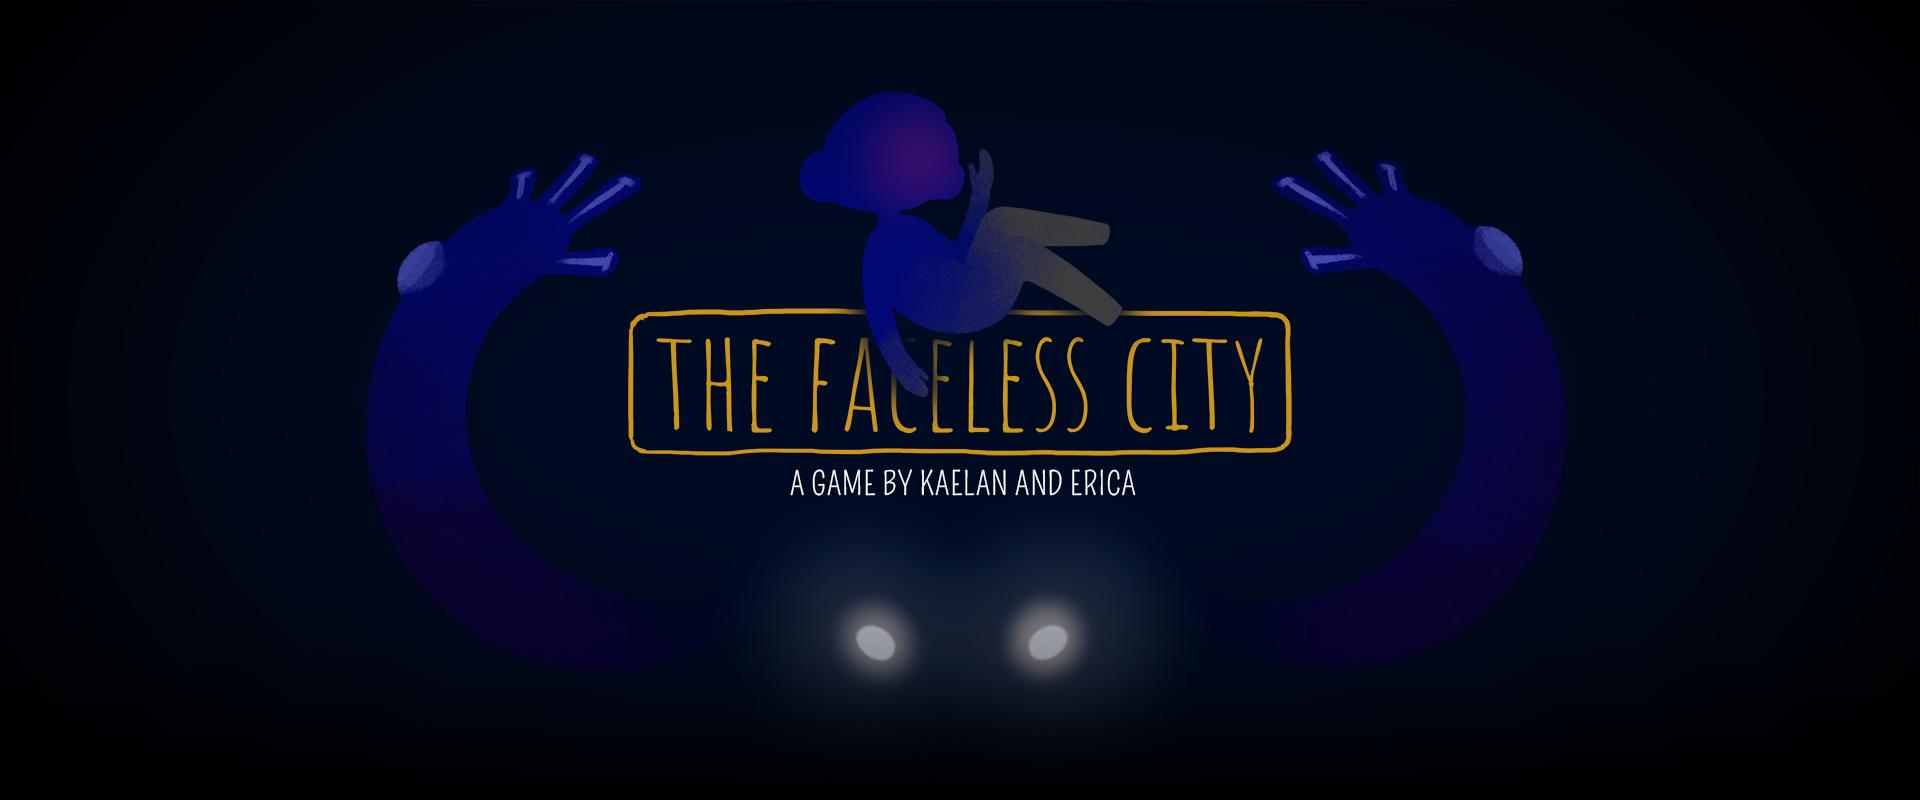 The Faceless City